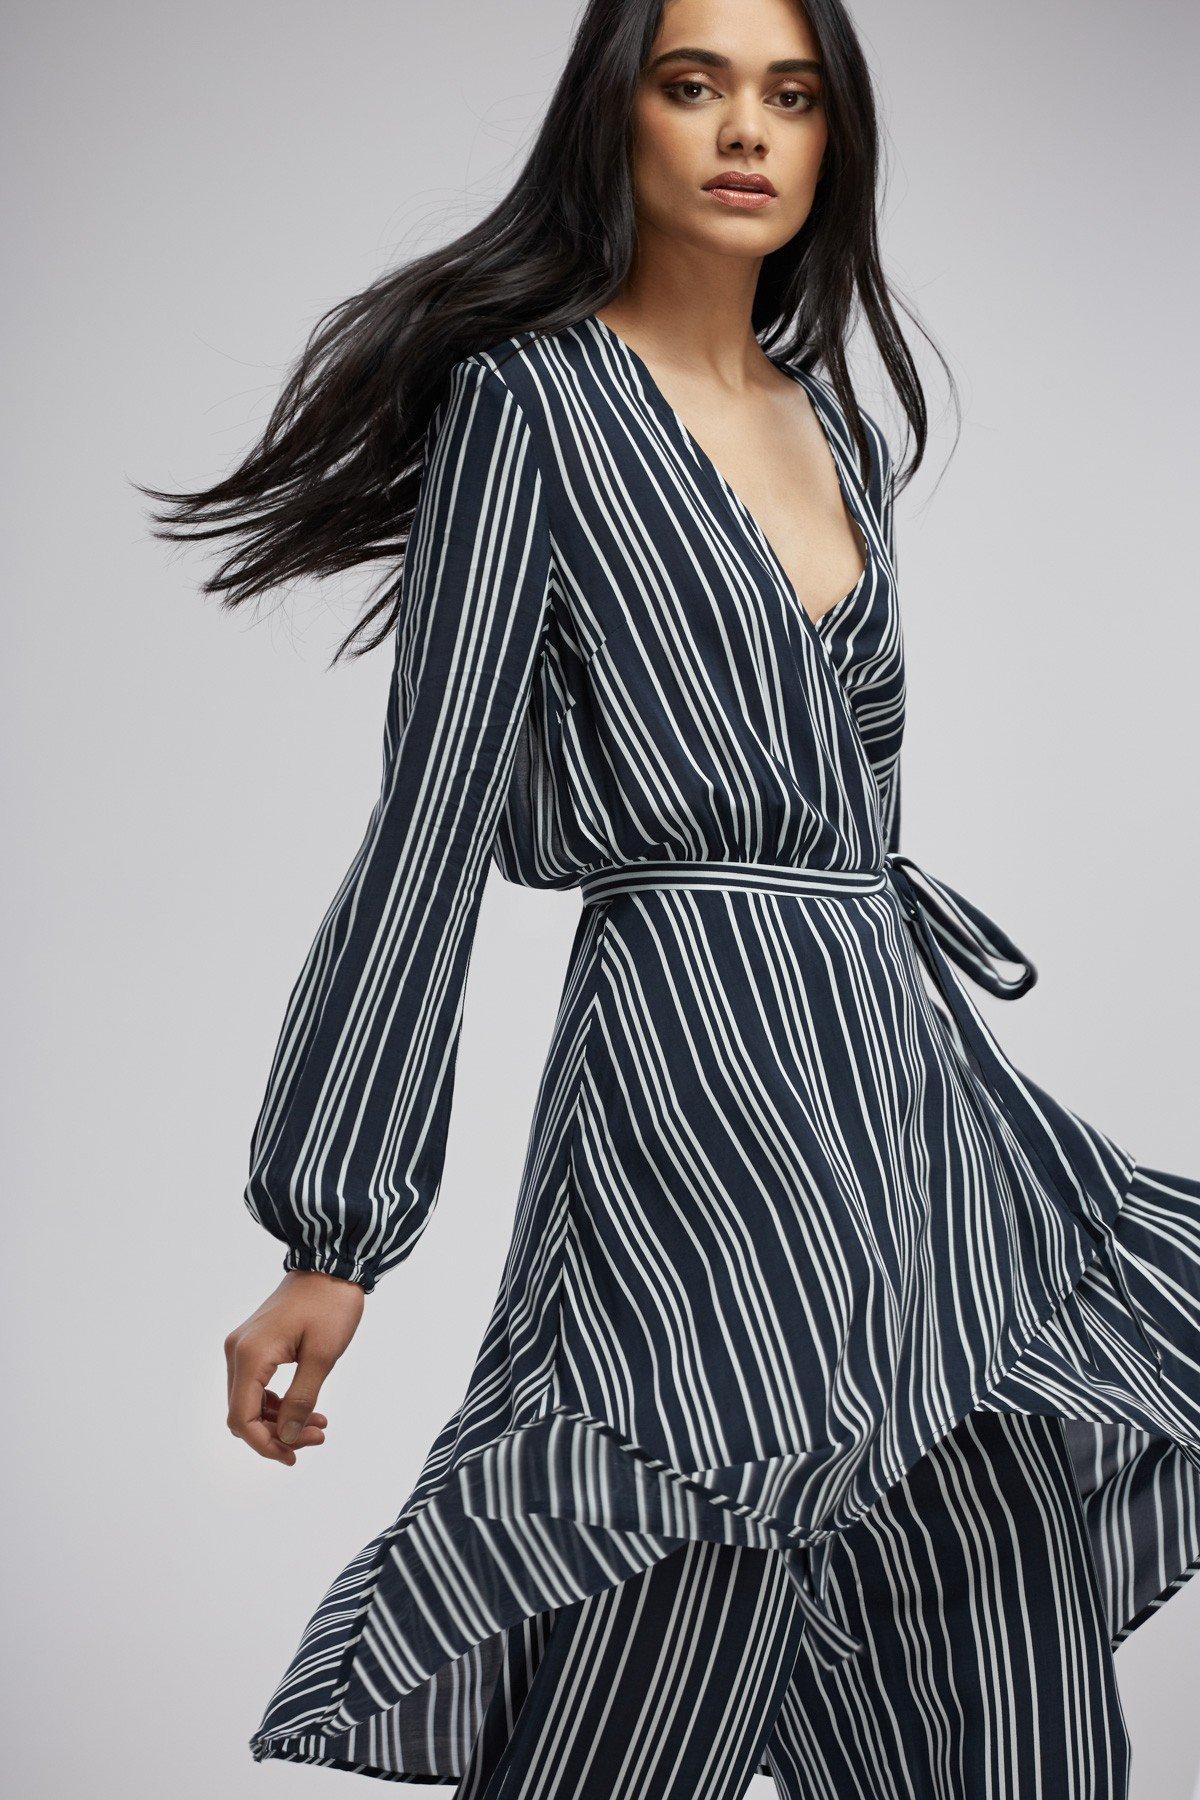 Shop Finders Ira Long Sleeve Dress.